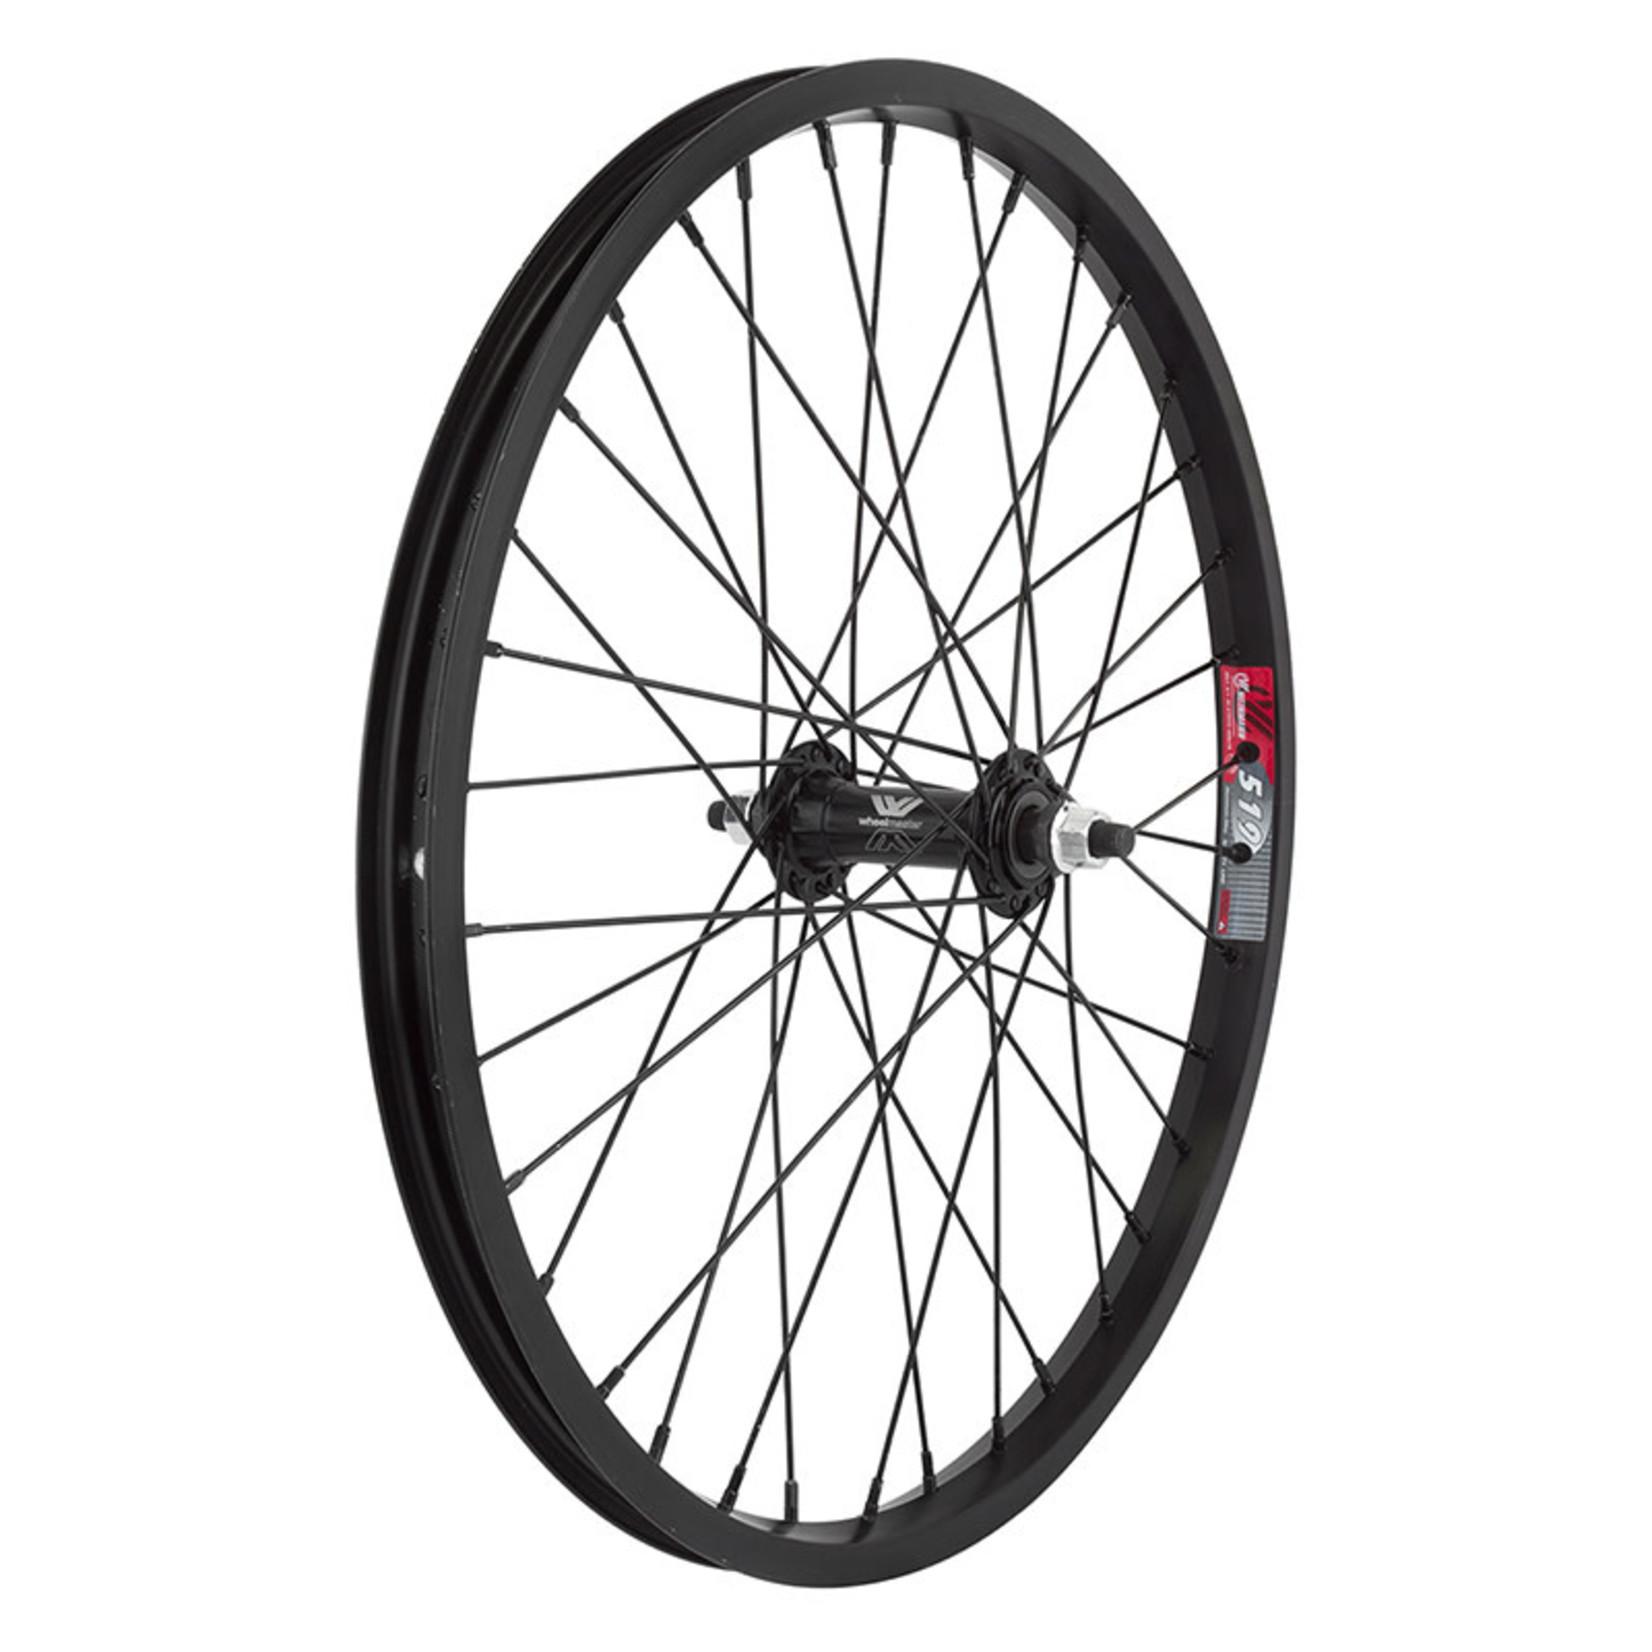 20'' Front Wheel Alloy BO 3/8 Black Single Wall